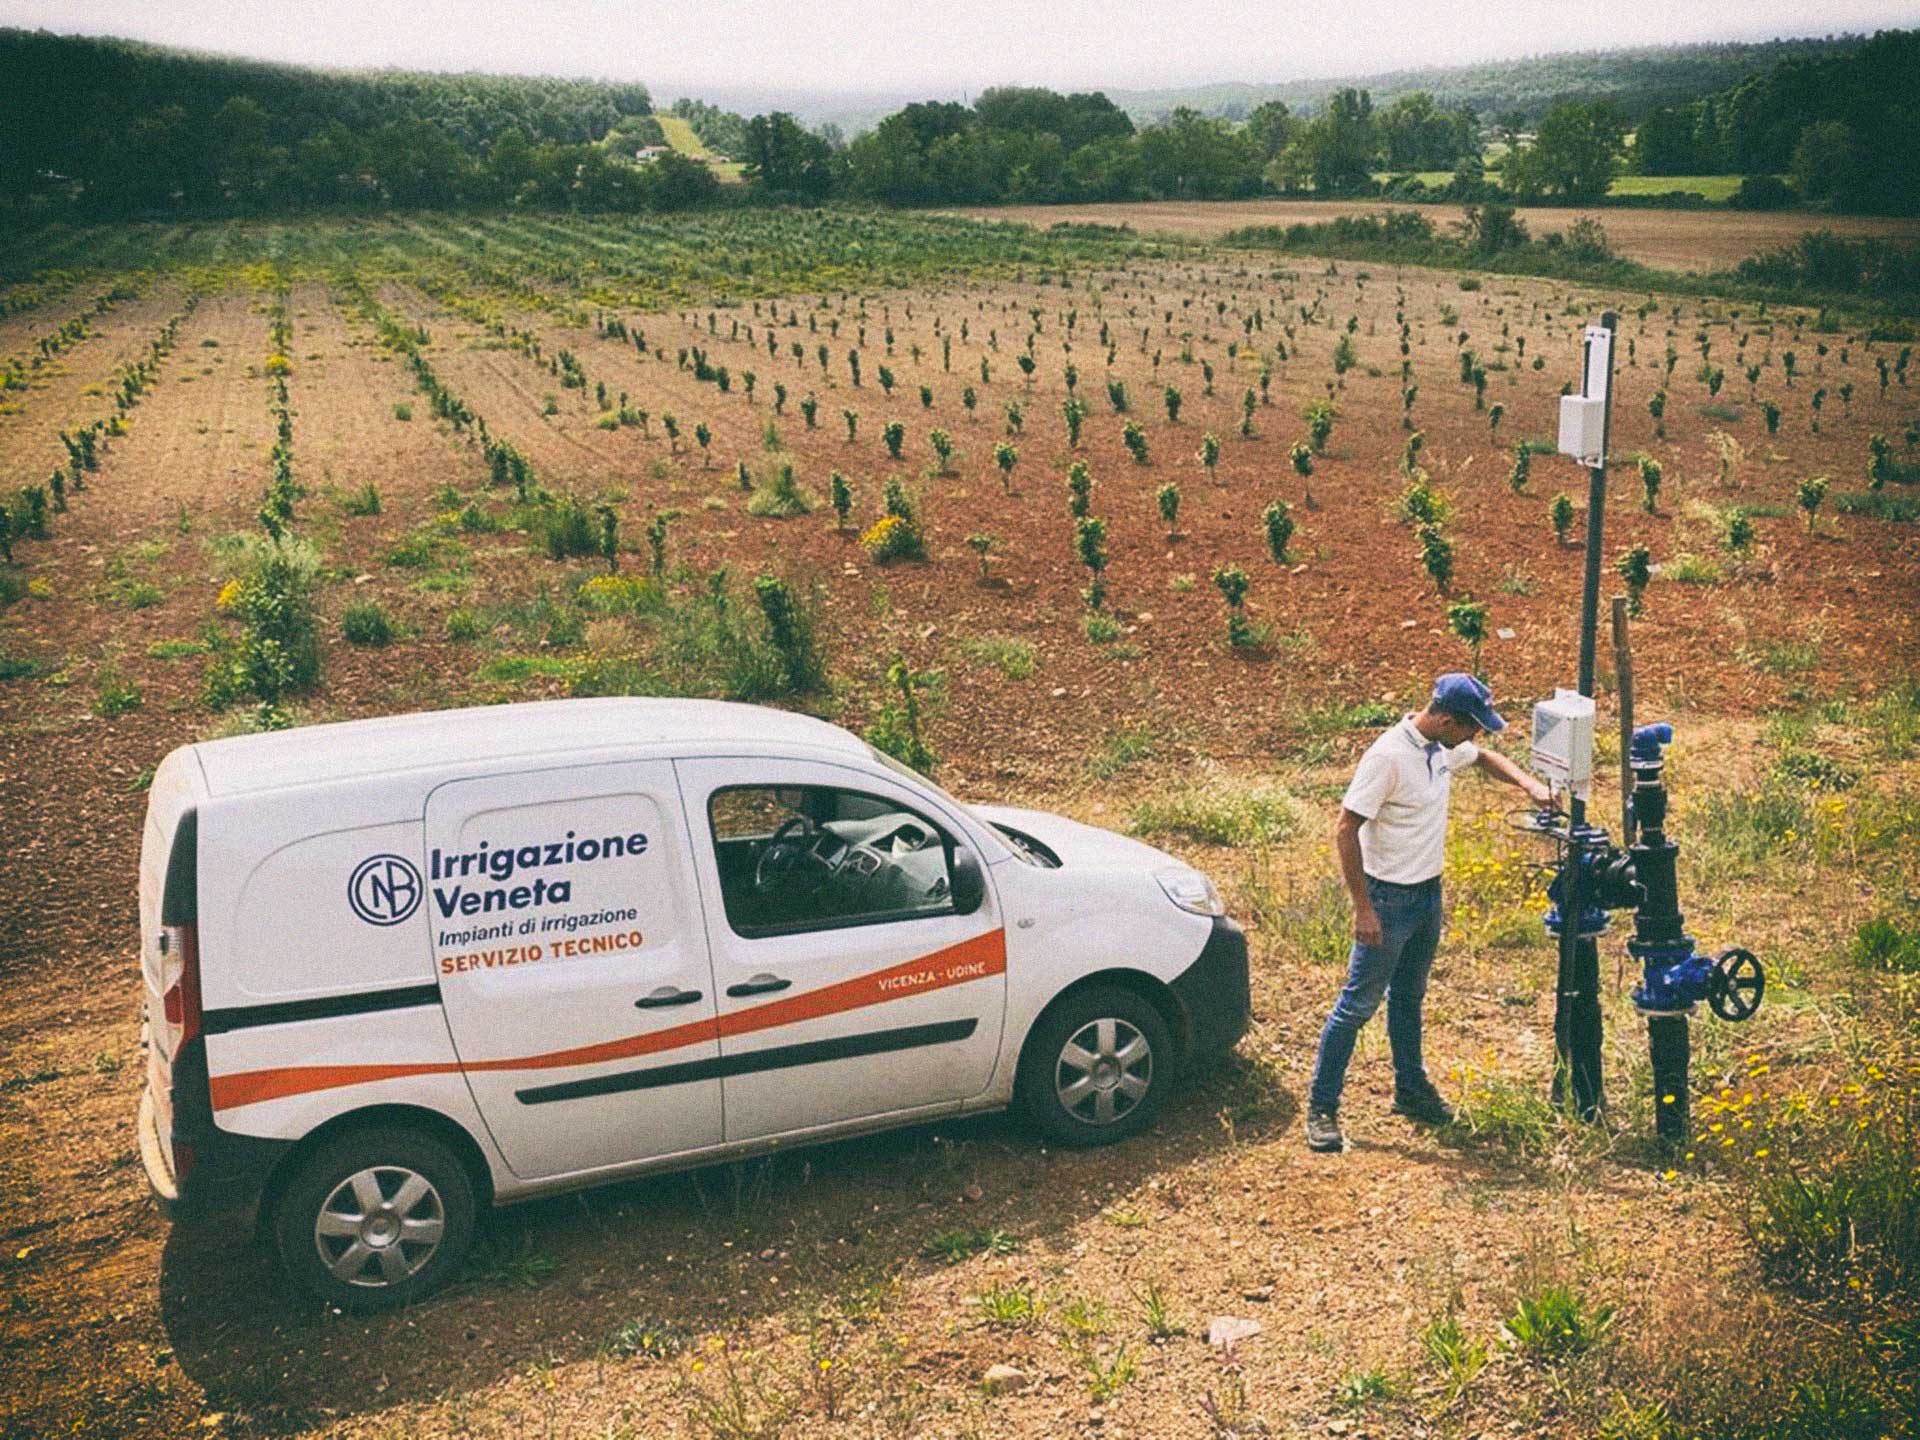 31 impianti irrigazione veneta